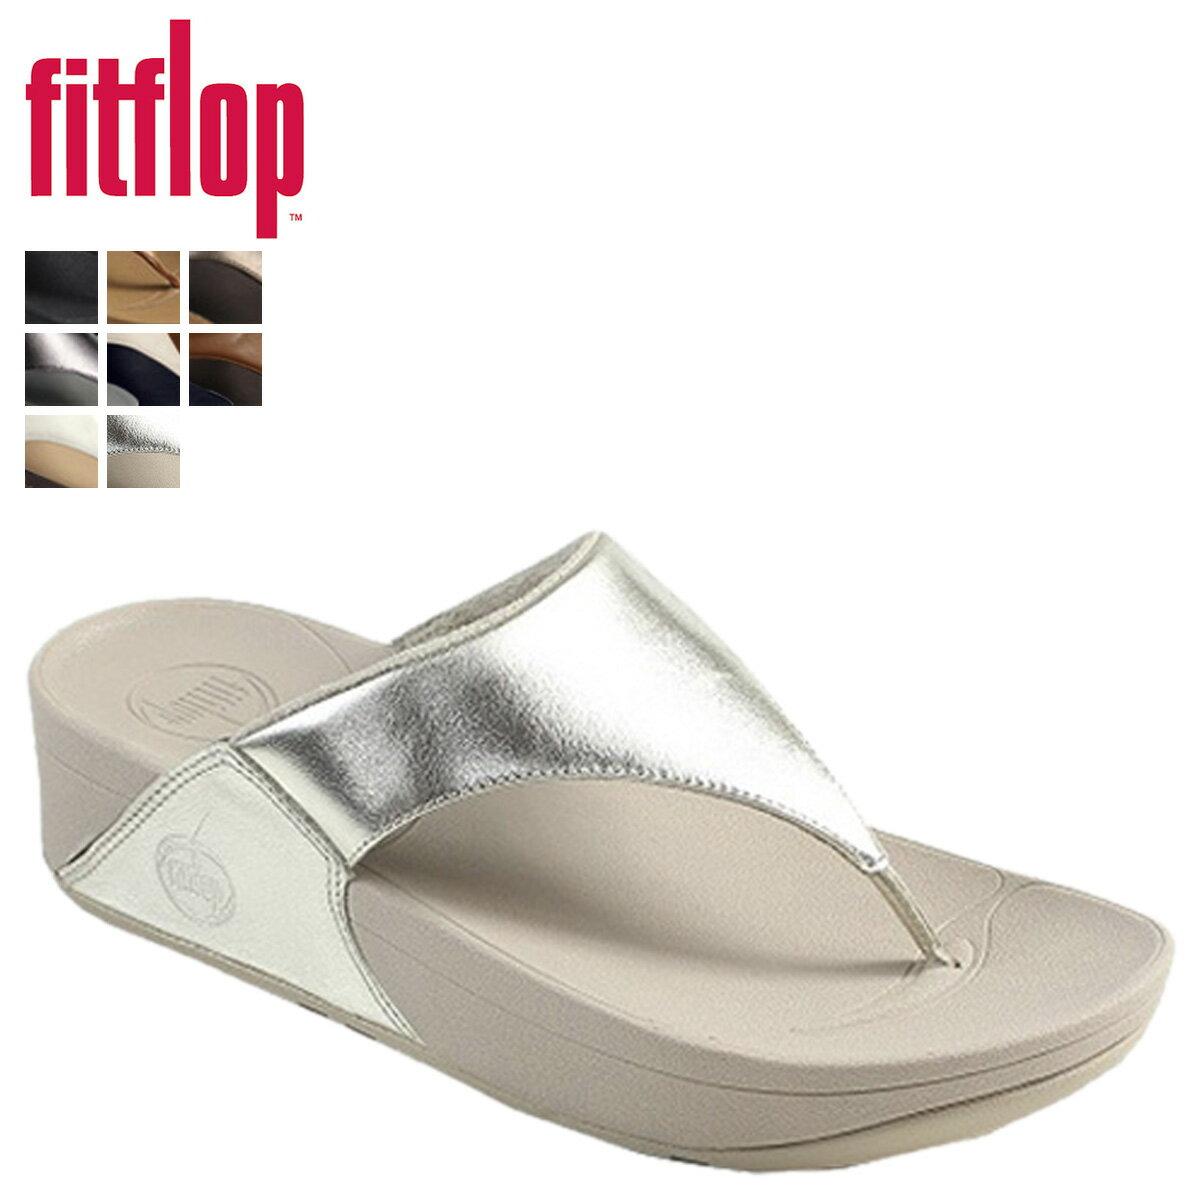 9168a80ae Fitflop Usa Store - Avanti House School